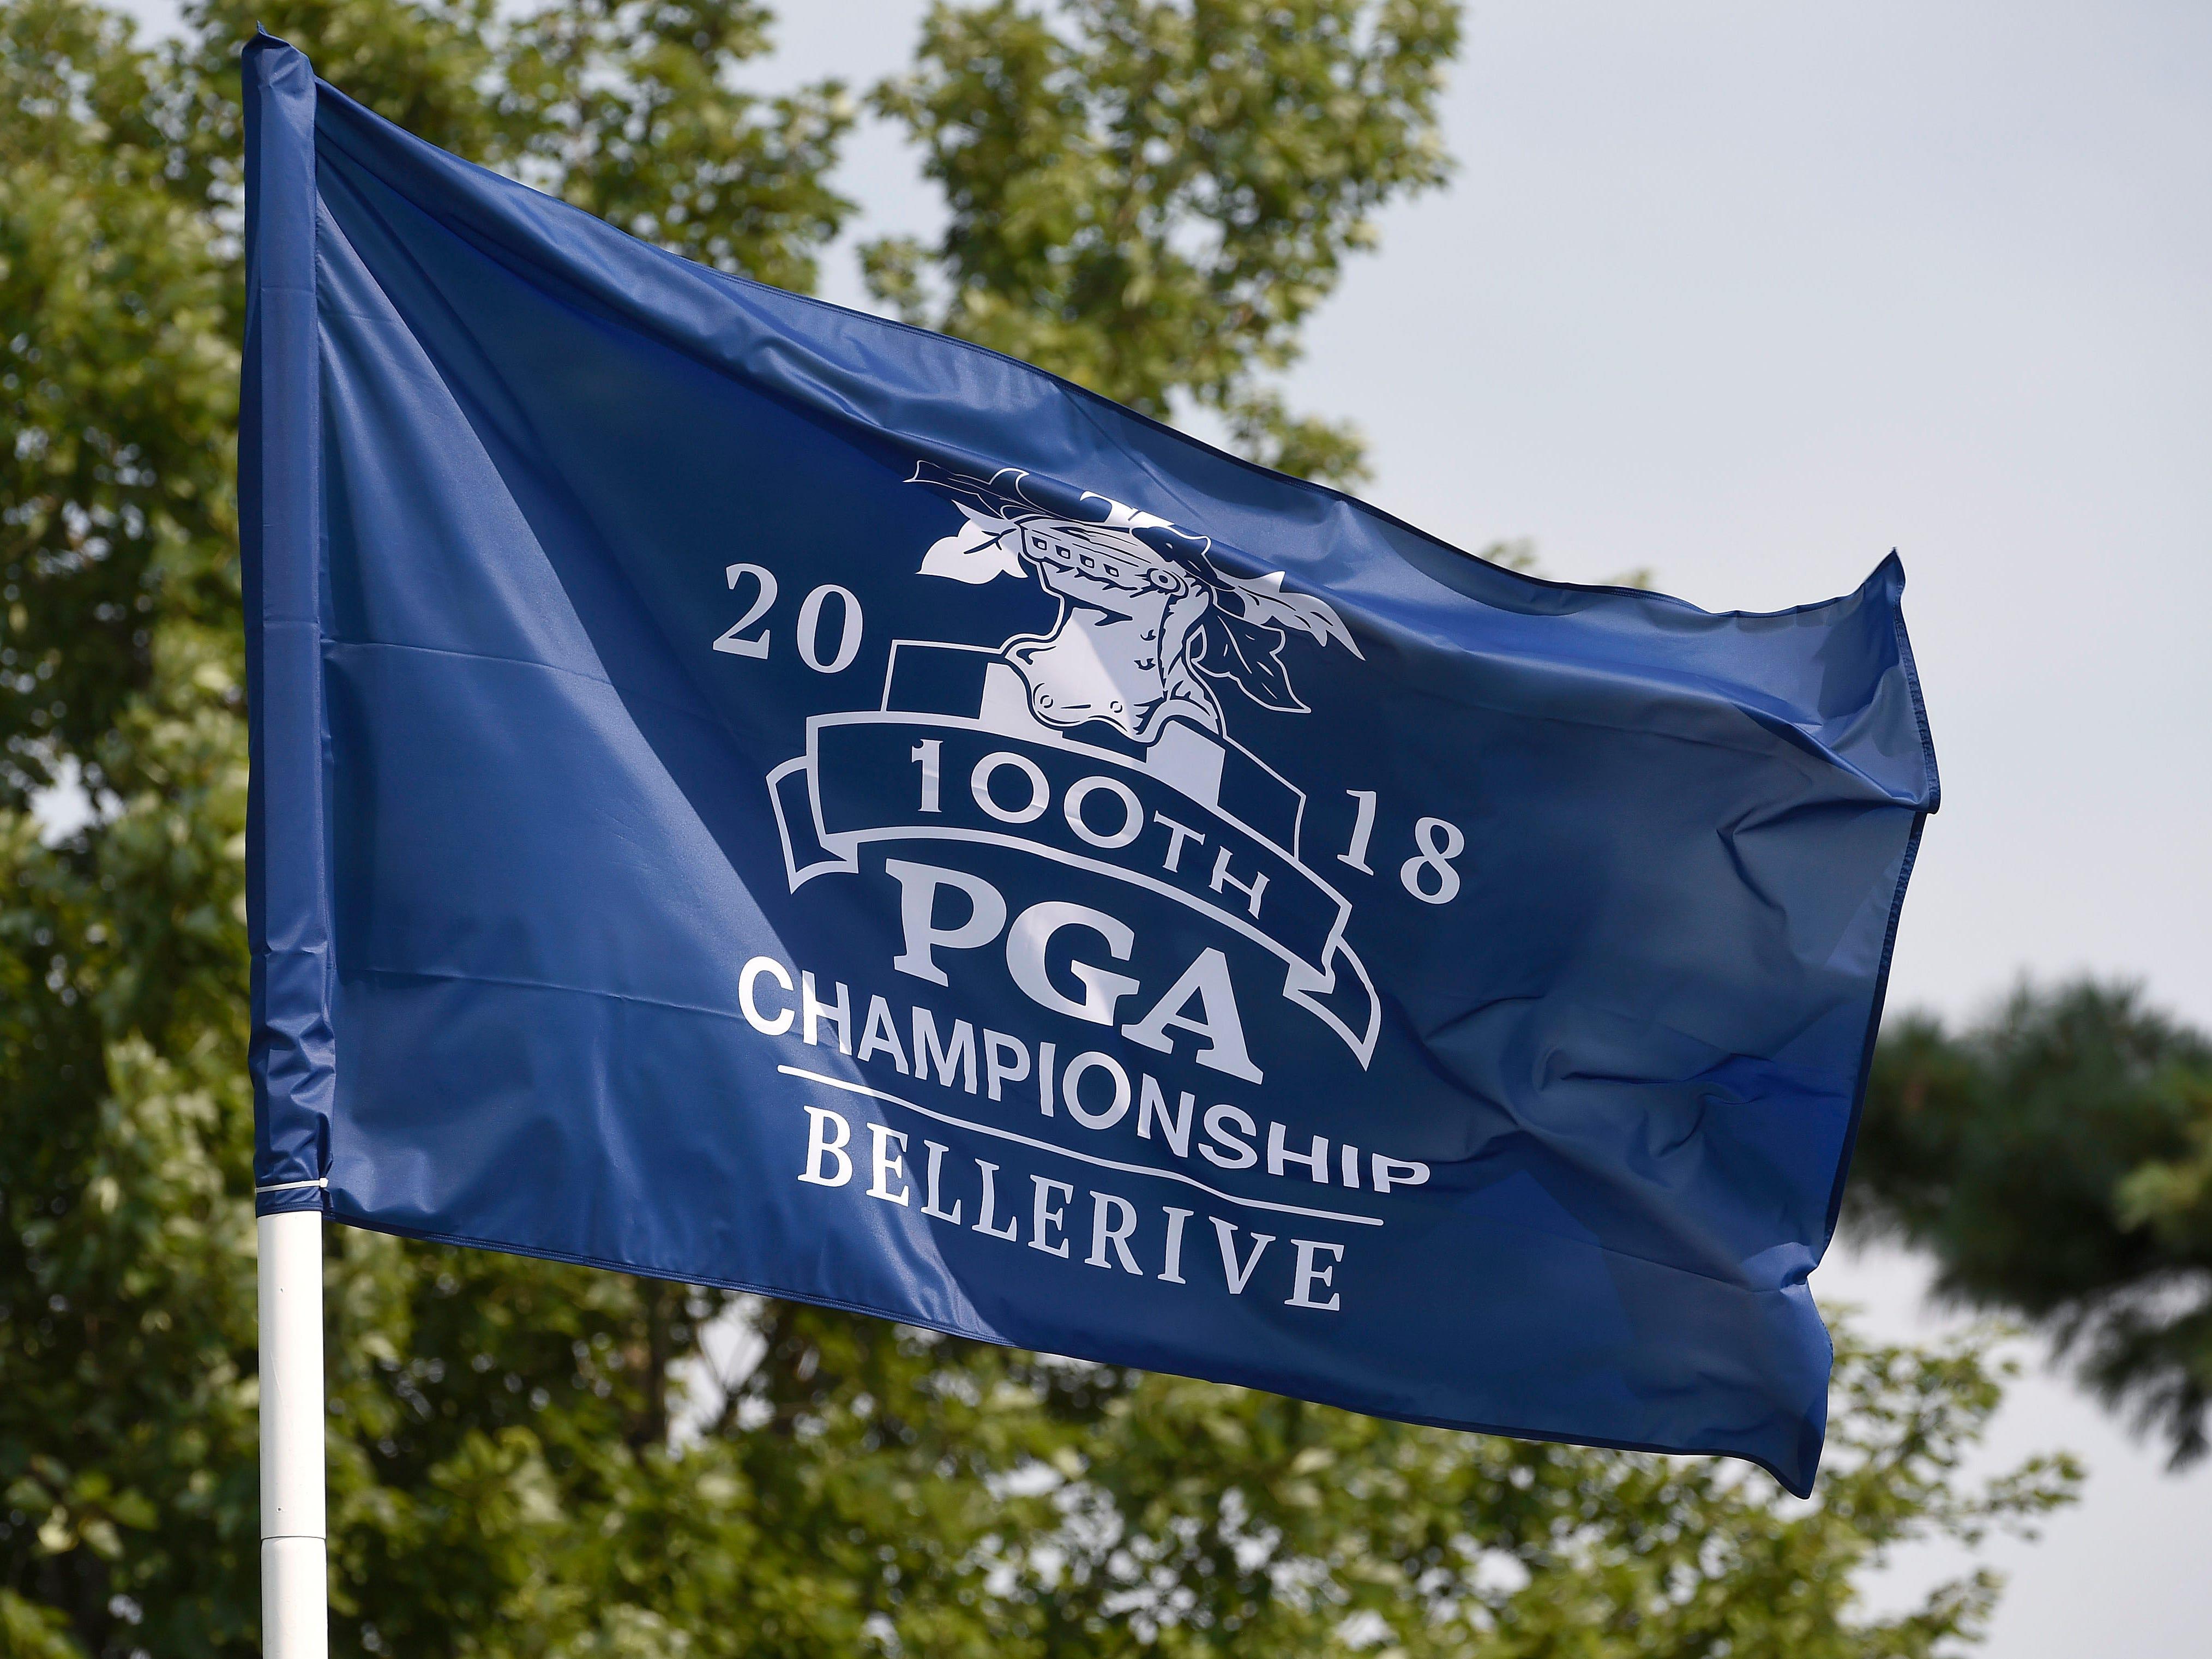 The 100th PGA Championship.